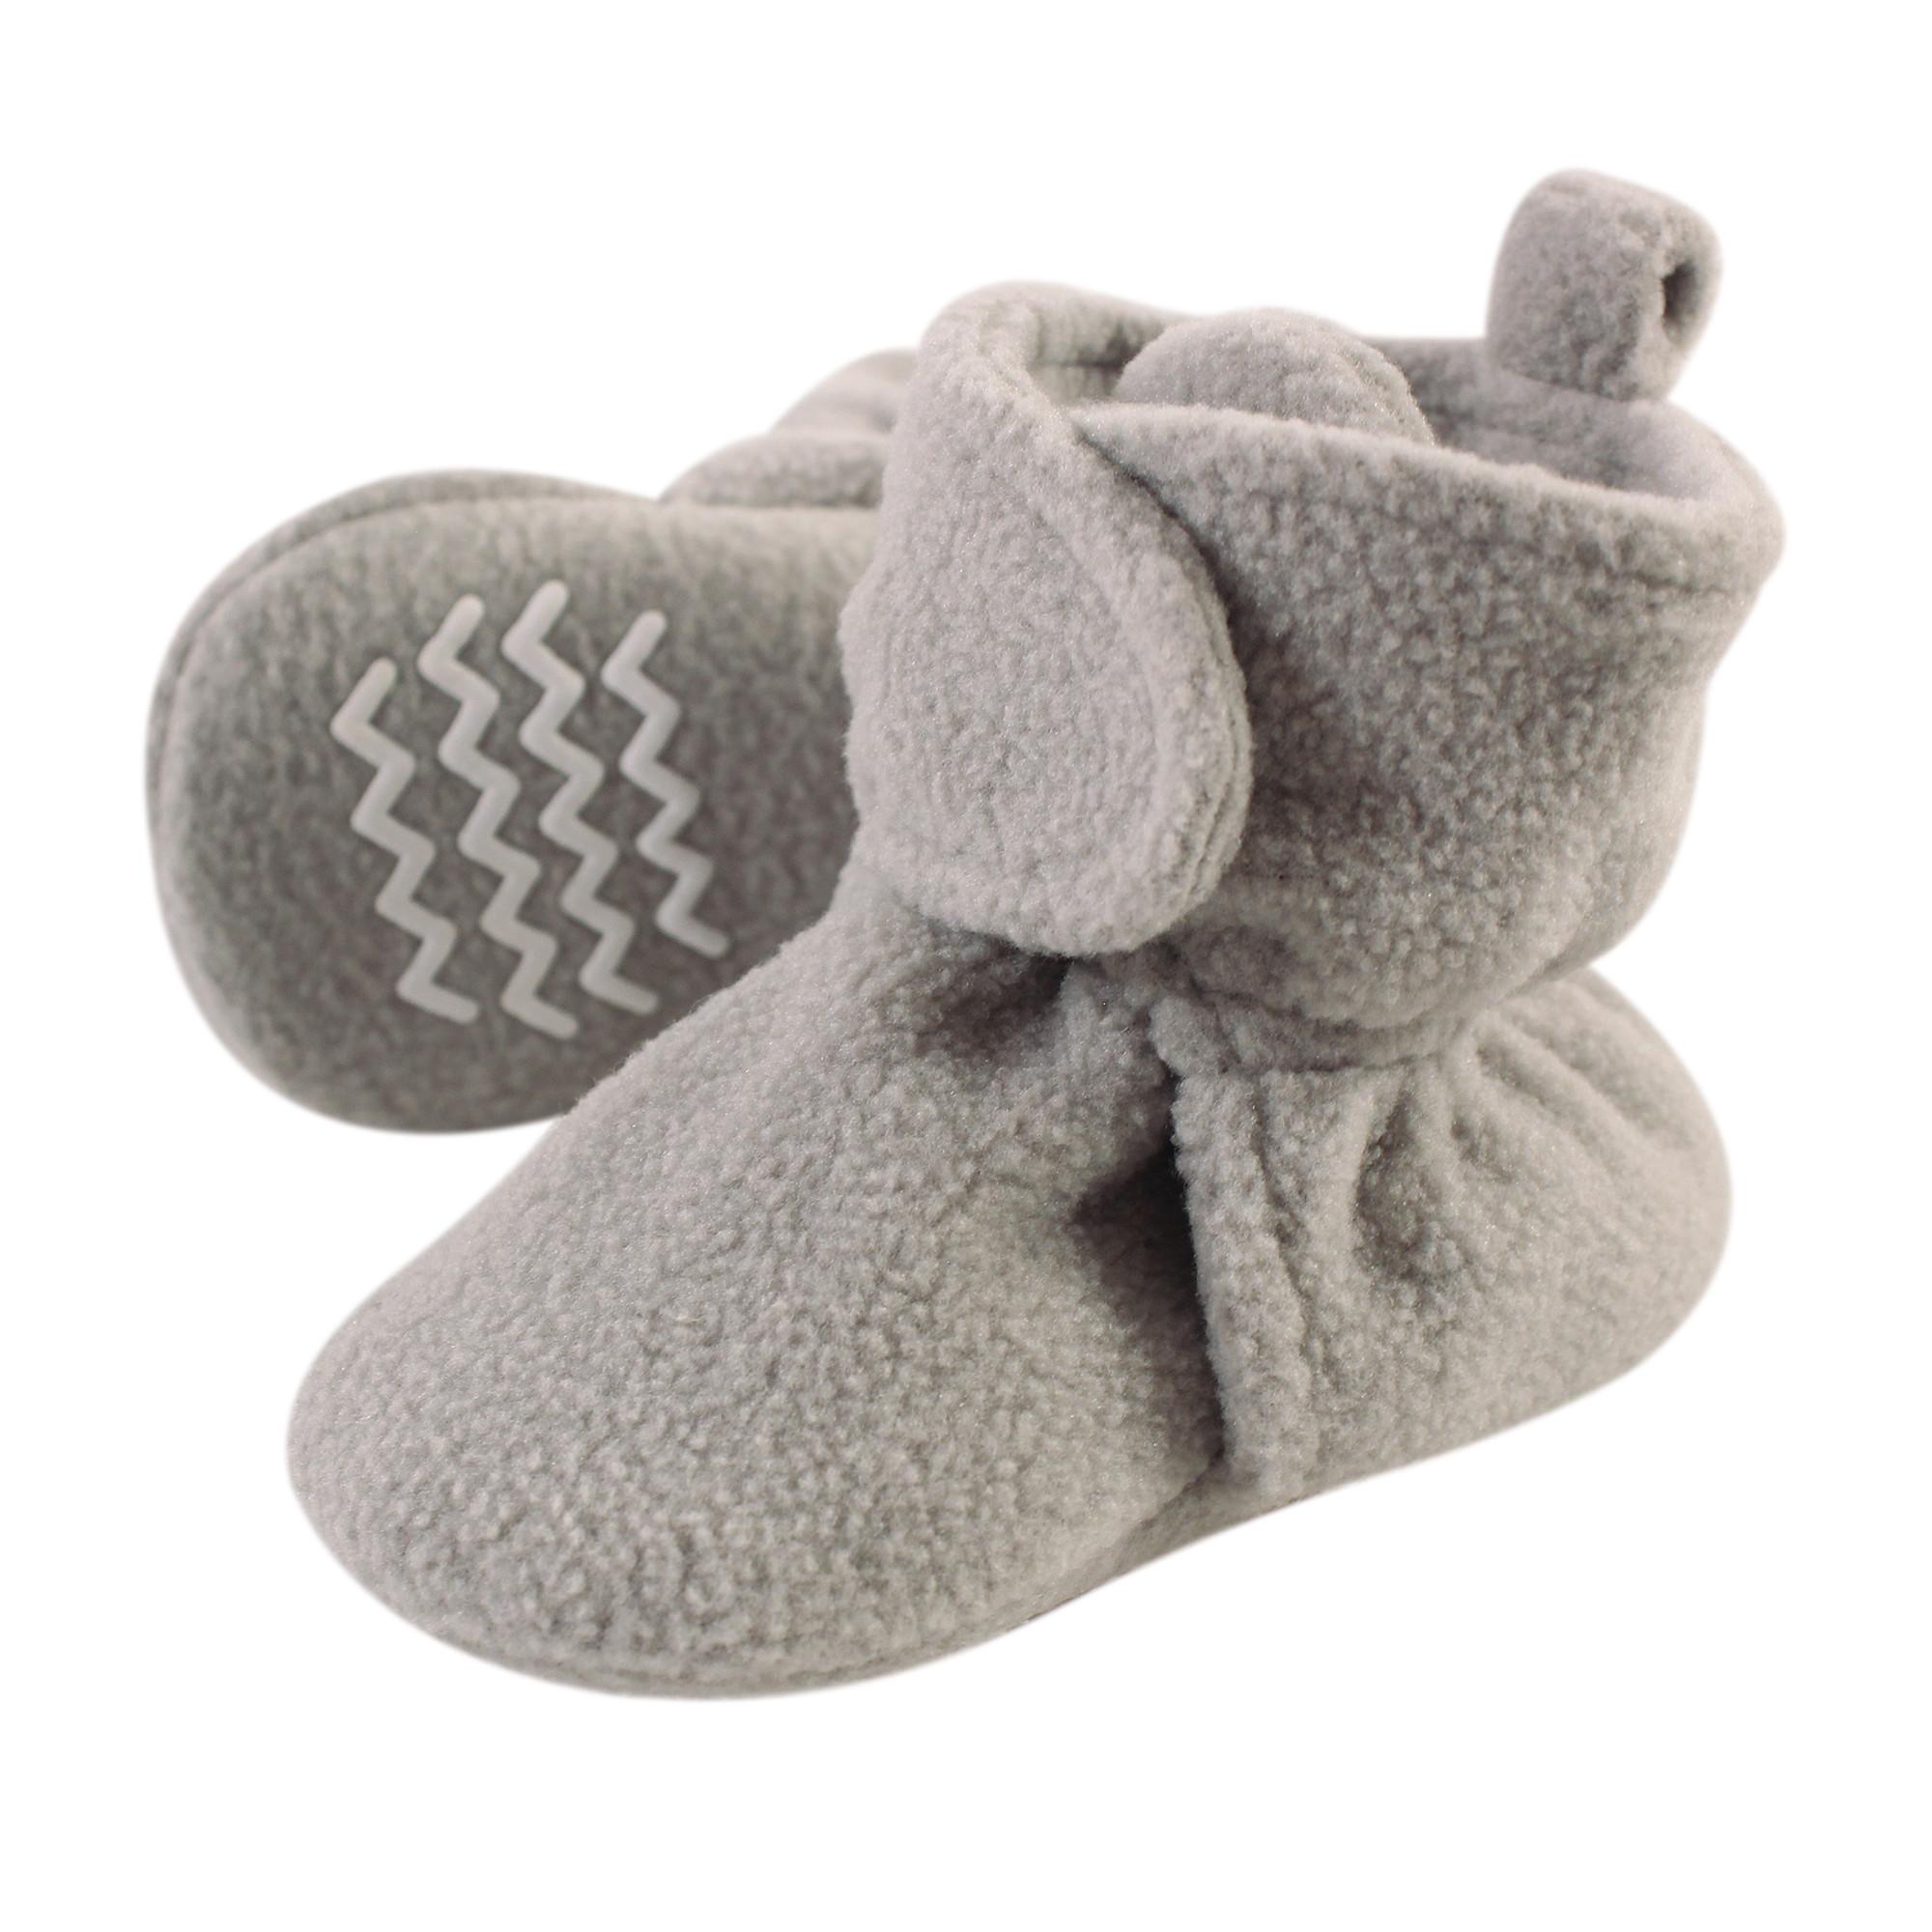 Fleece Lined Booties, Neutral Gray